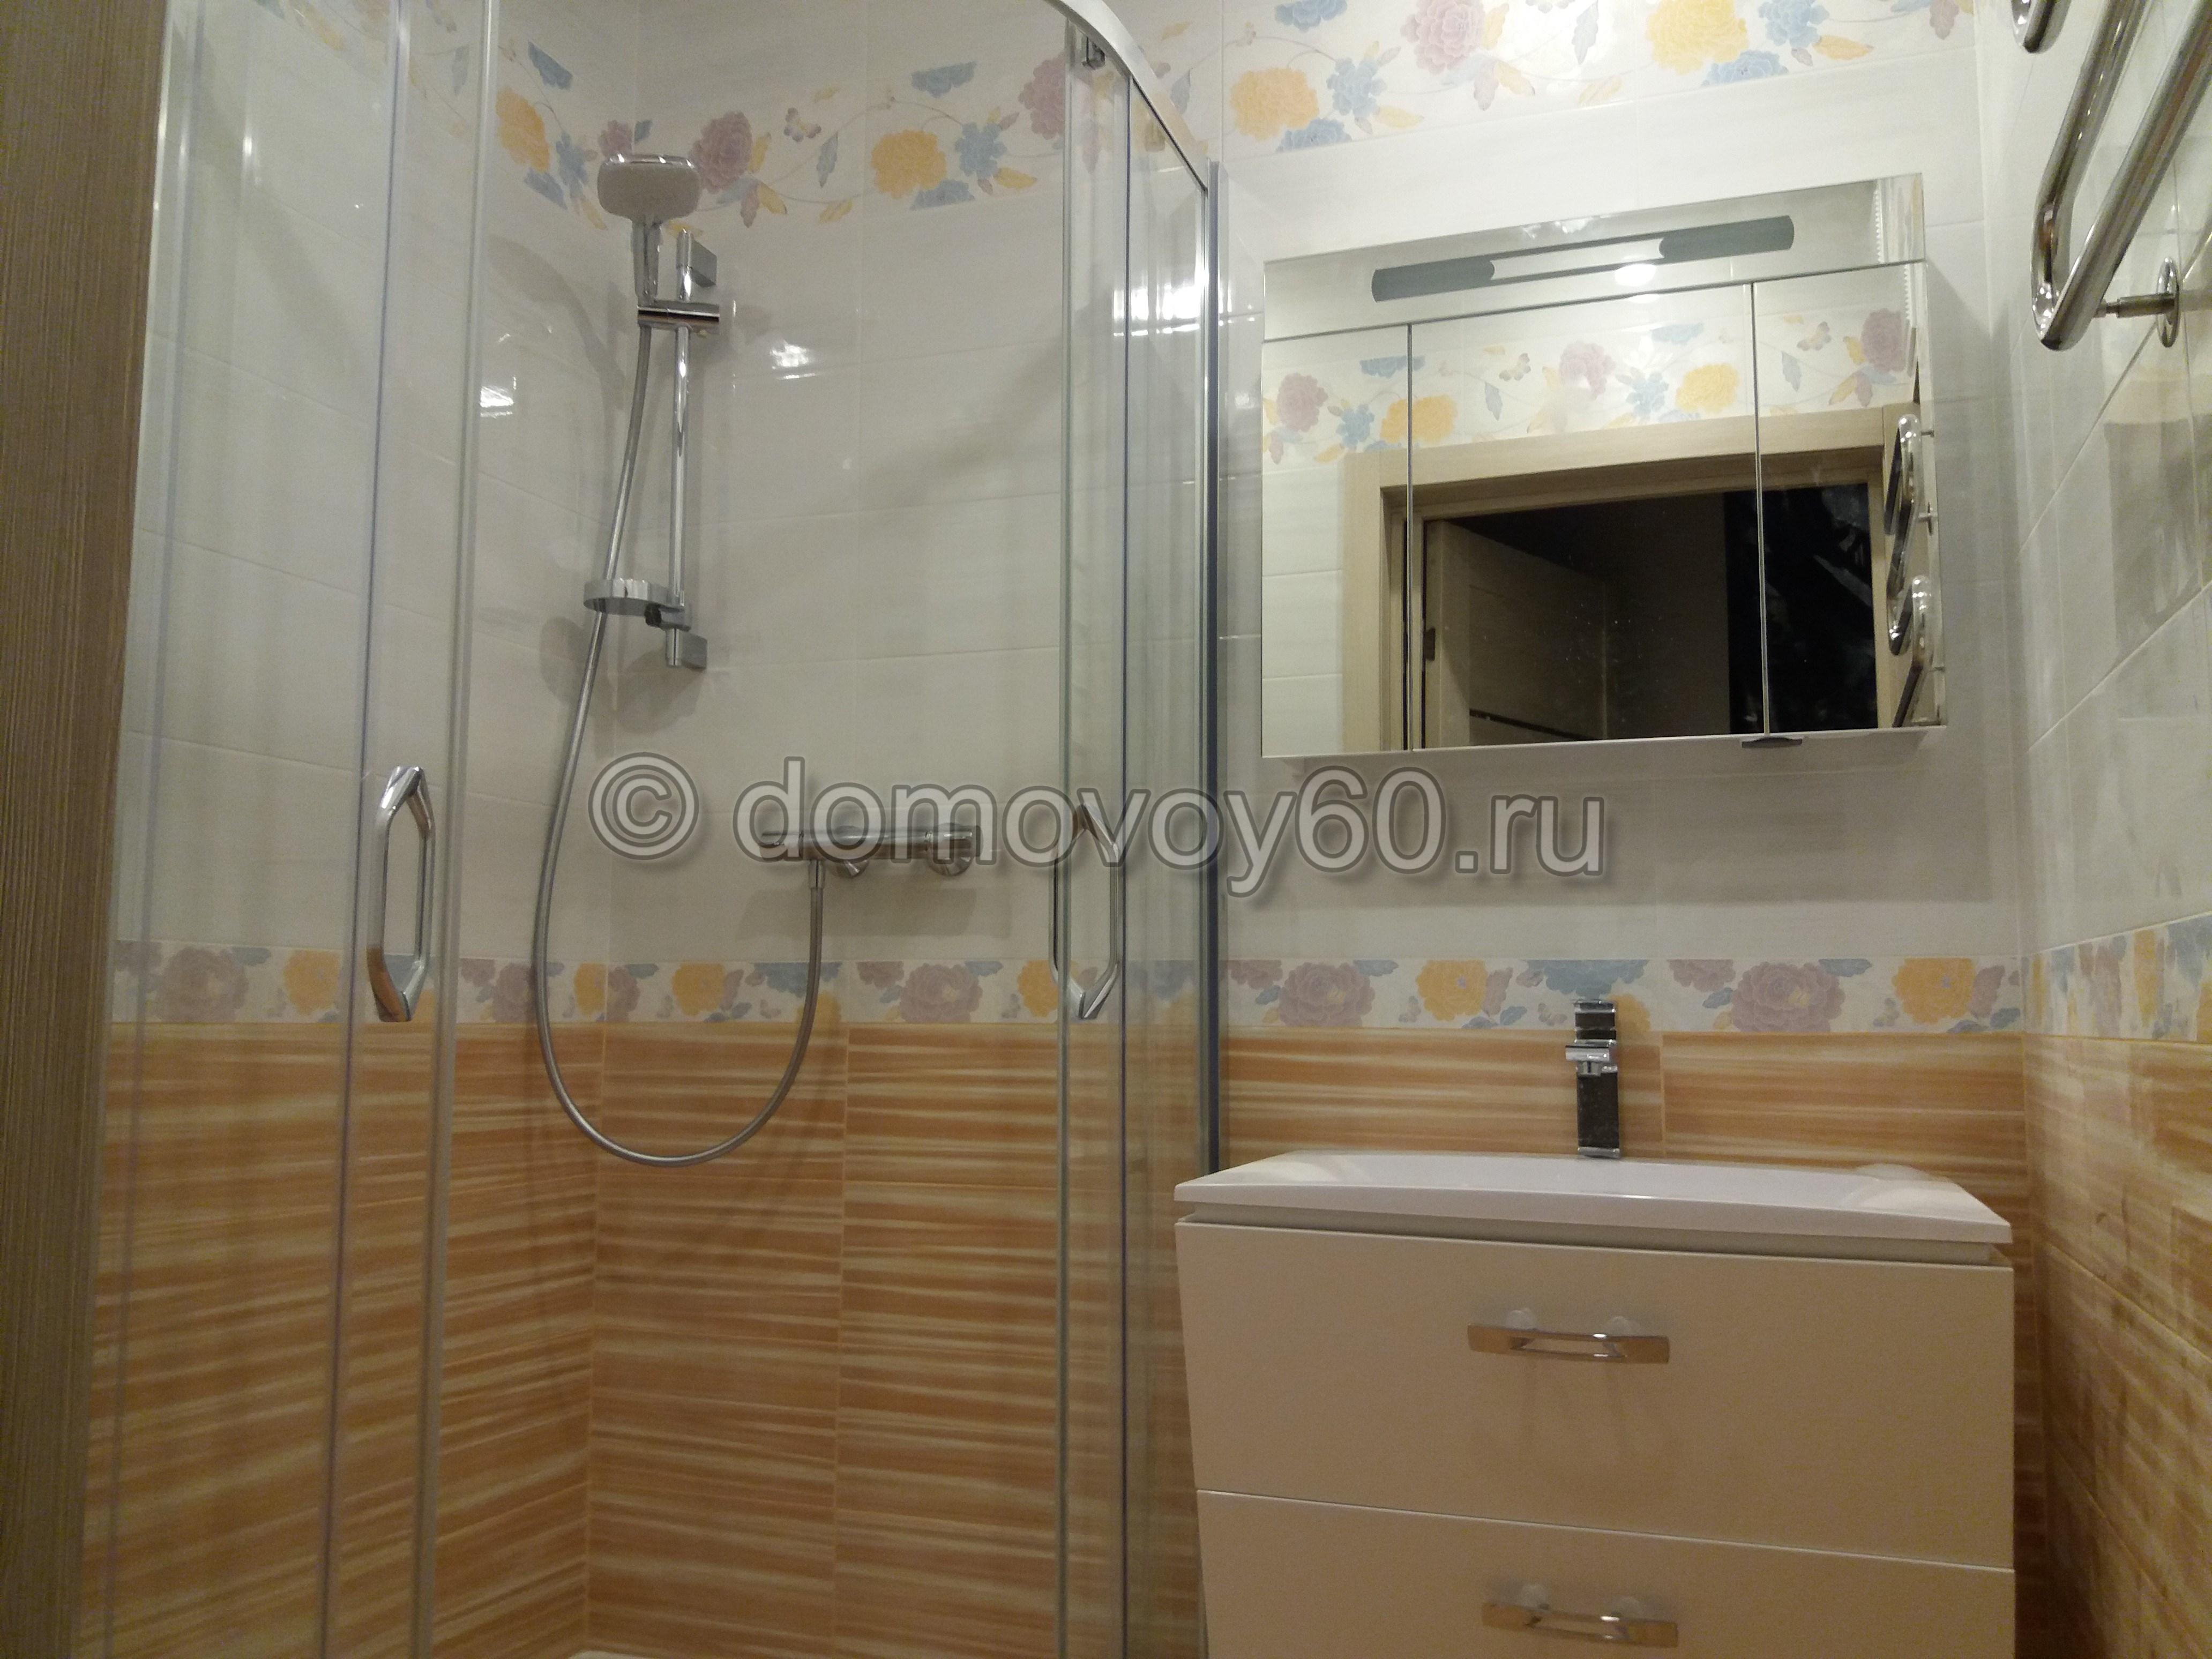 domovoy60-088